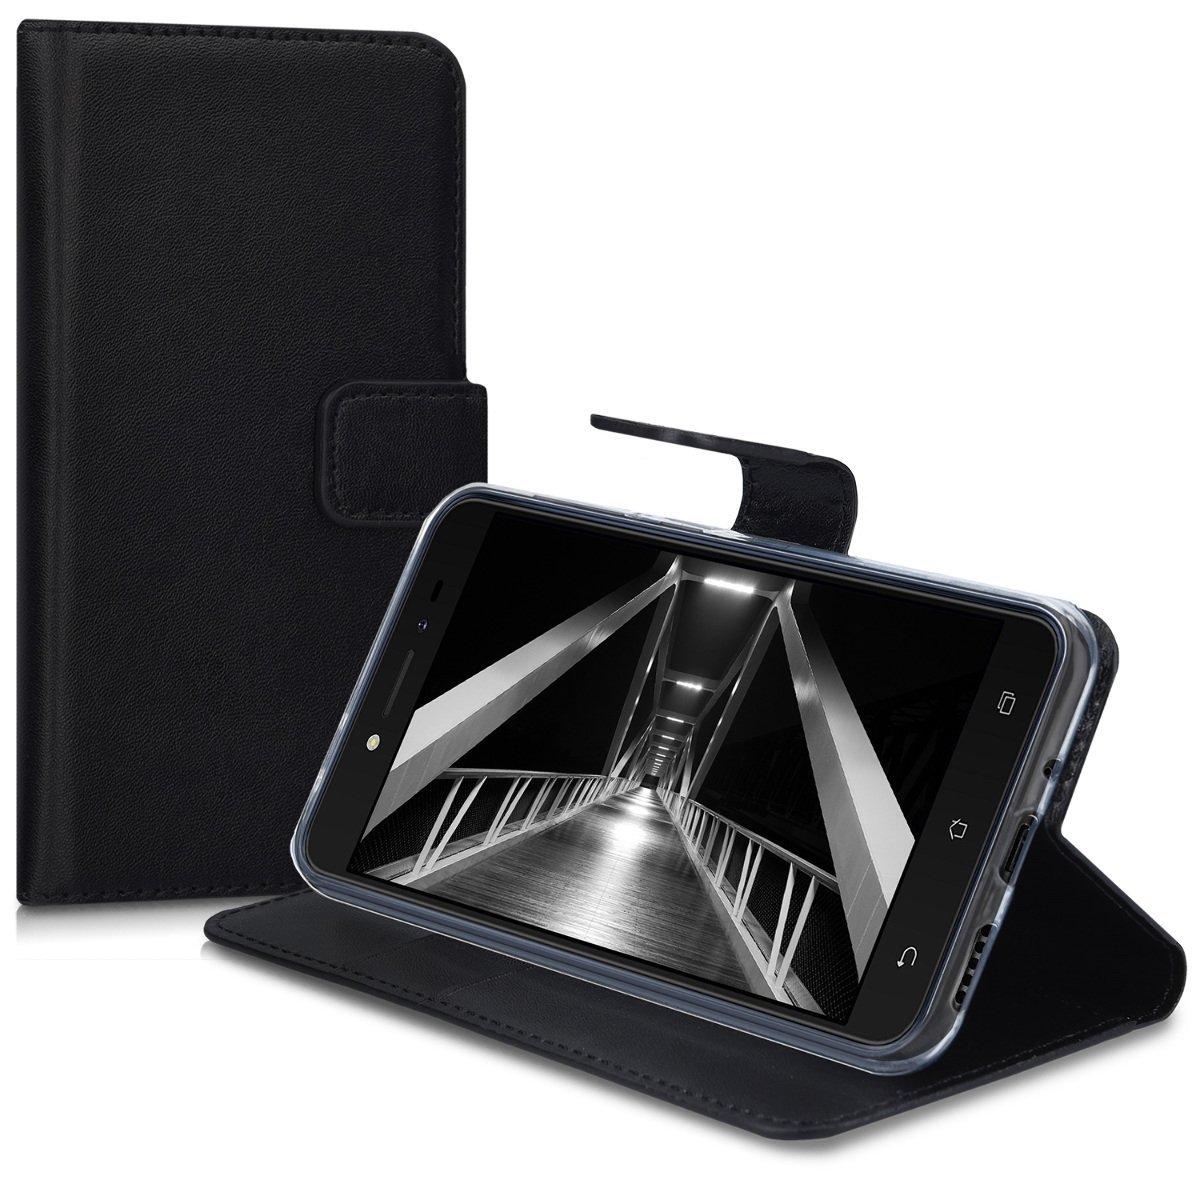 KW Θήκη - Πορτοφόλι Asus Zenfone Live - Black (42586.01) θήκες κινητών